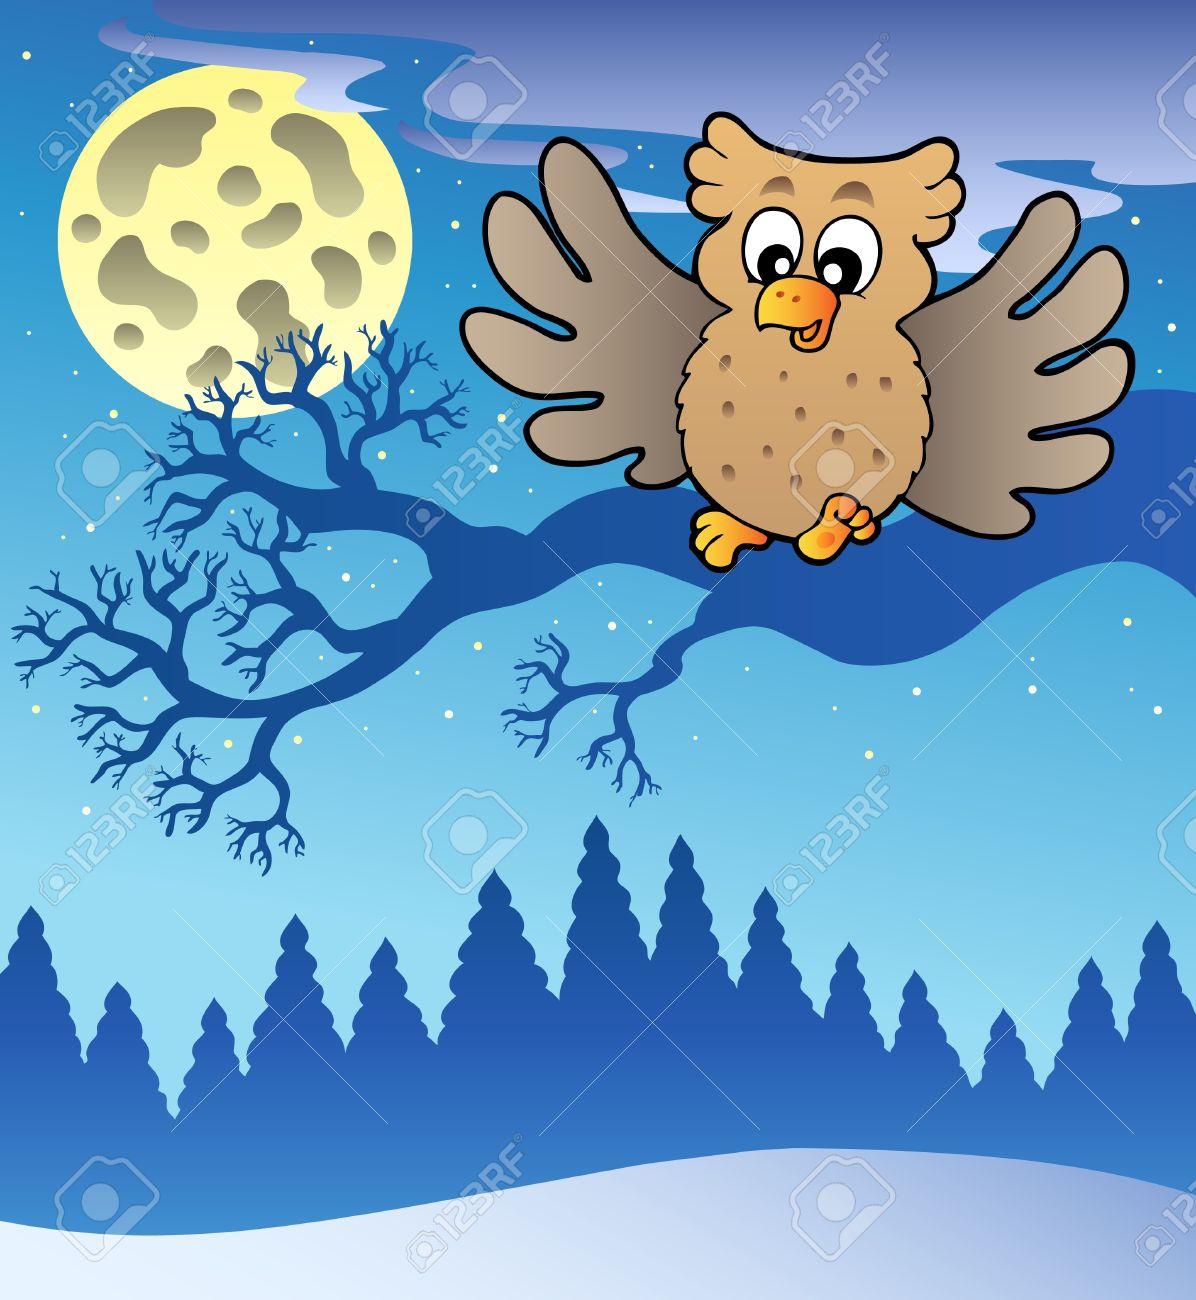 Cute flying owl in snowy landscape - illustration. Stock Vector - 8475480